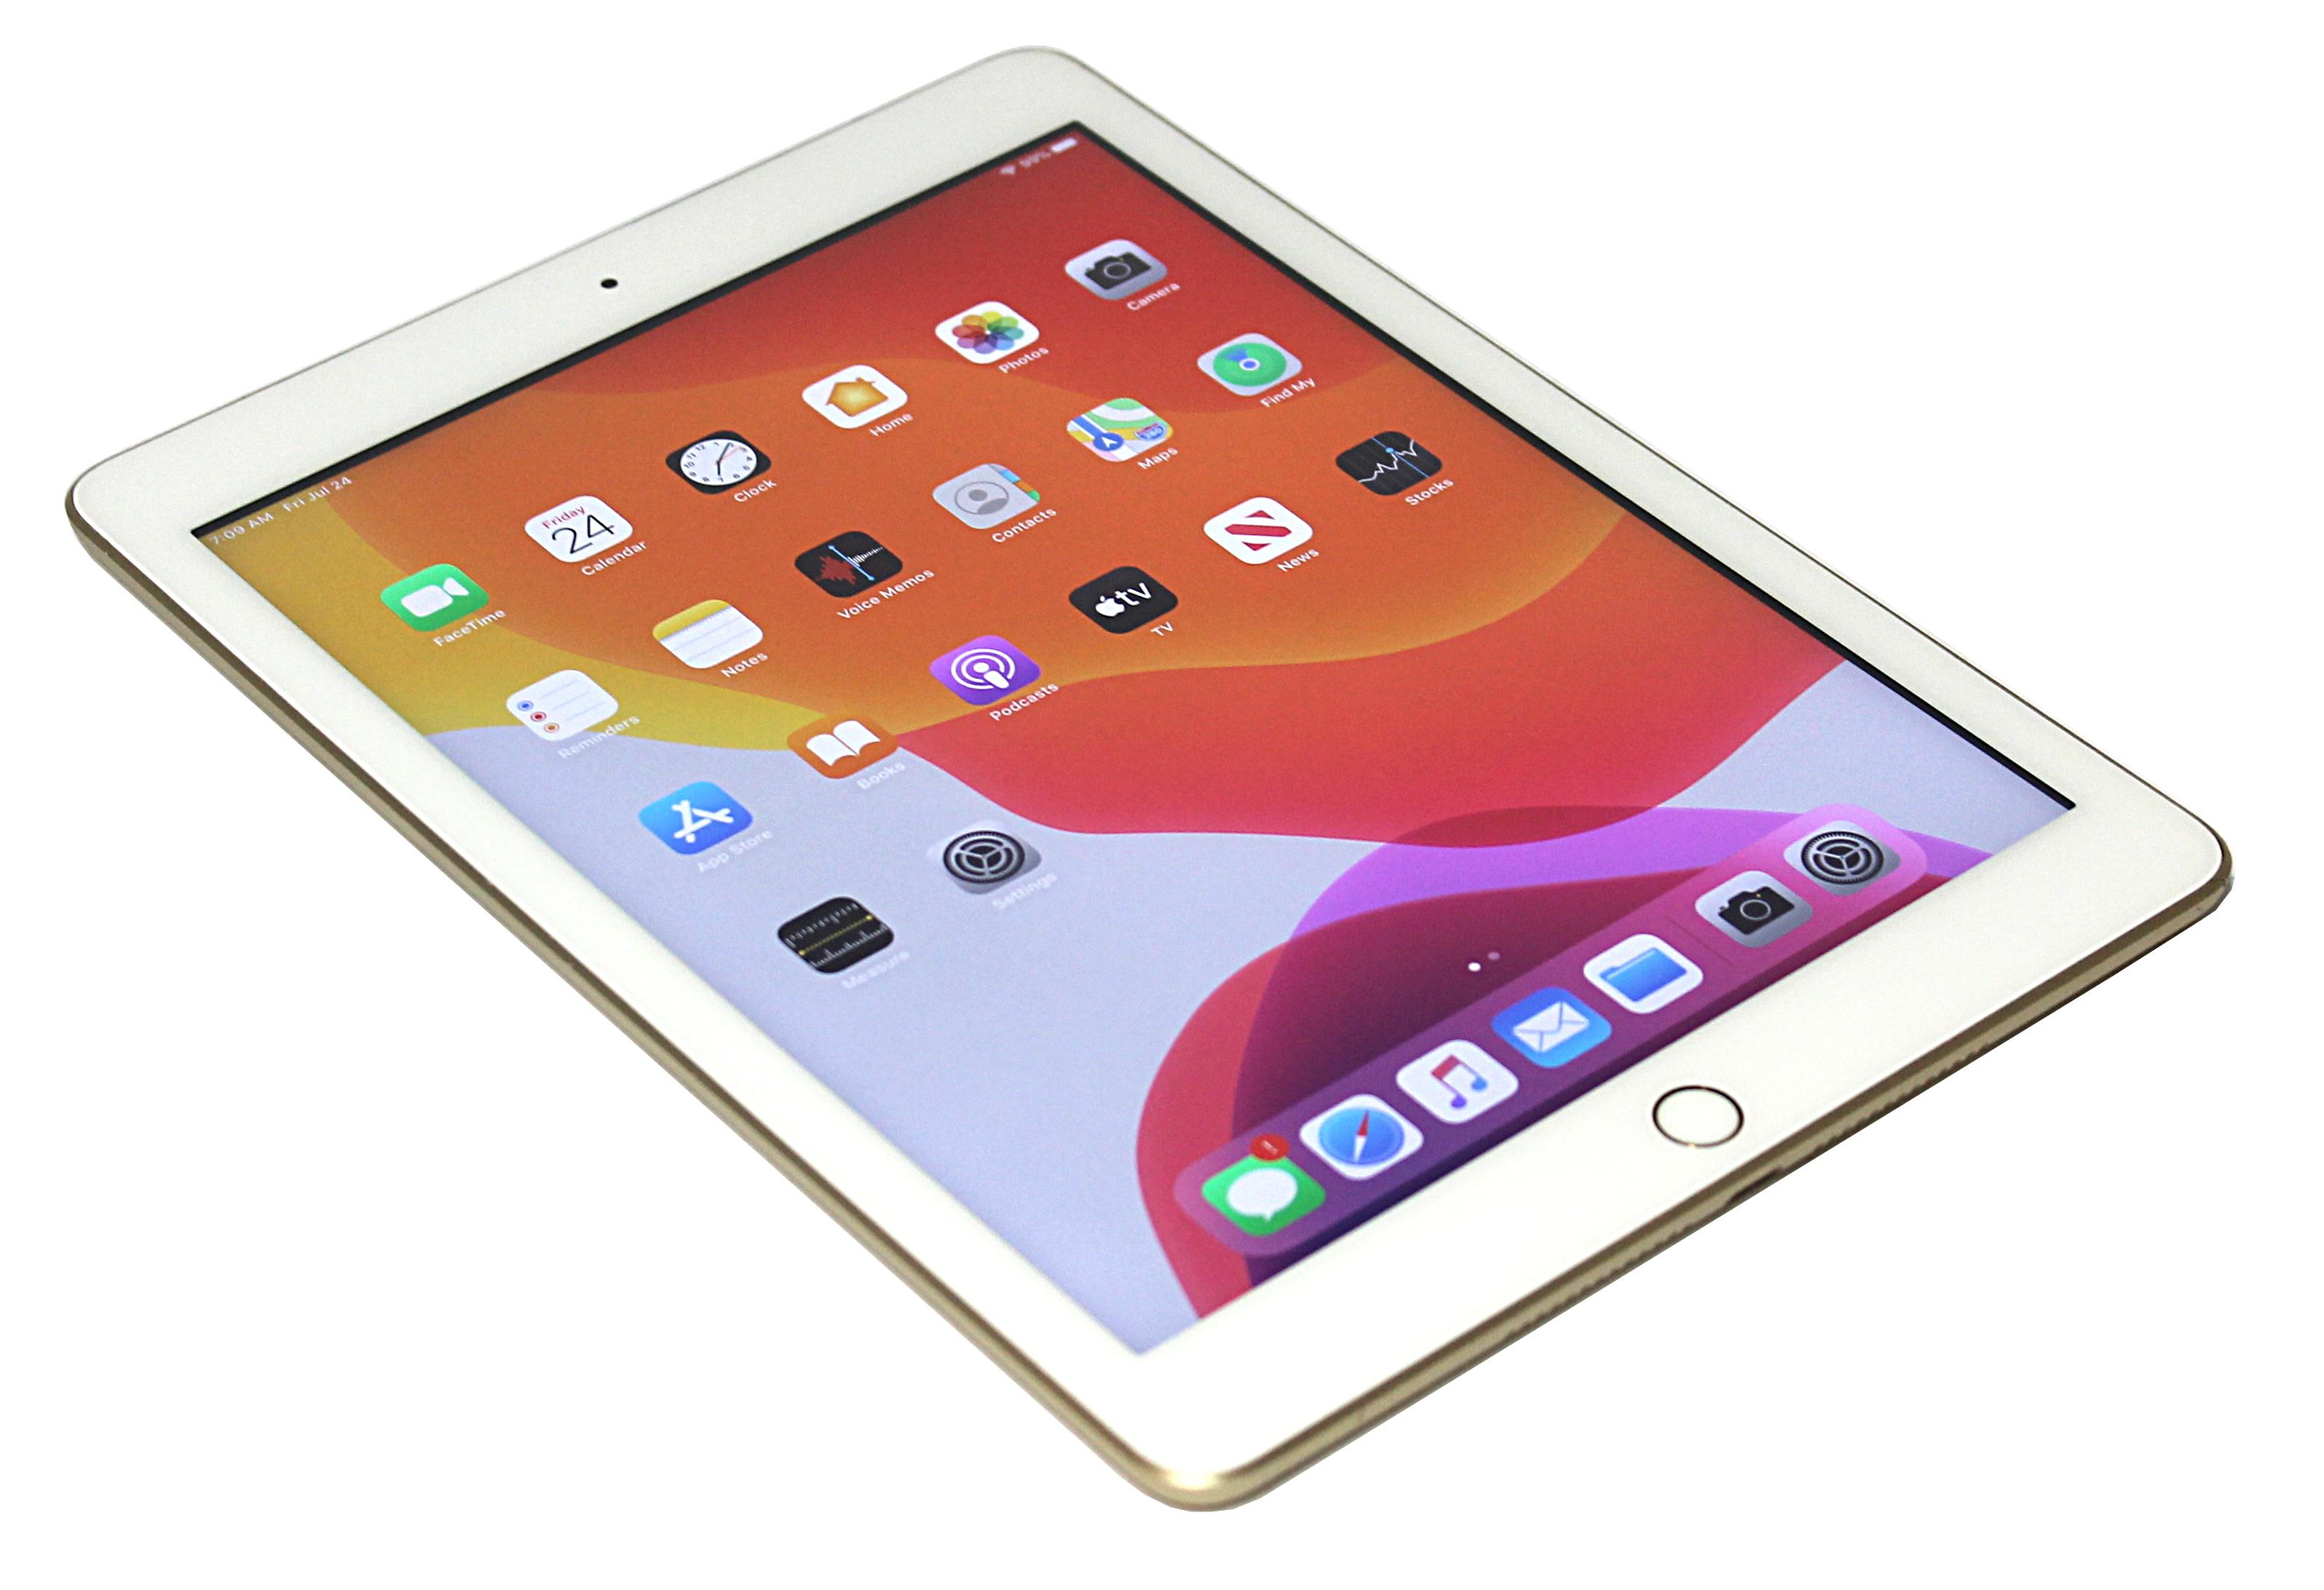 Apple iPad 5th Gen A1822 32GB WiFi Gold Refurbished